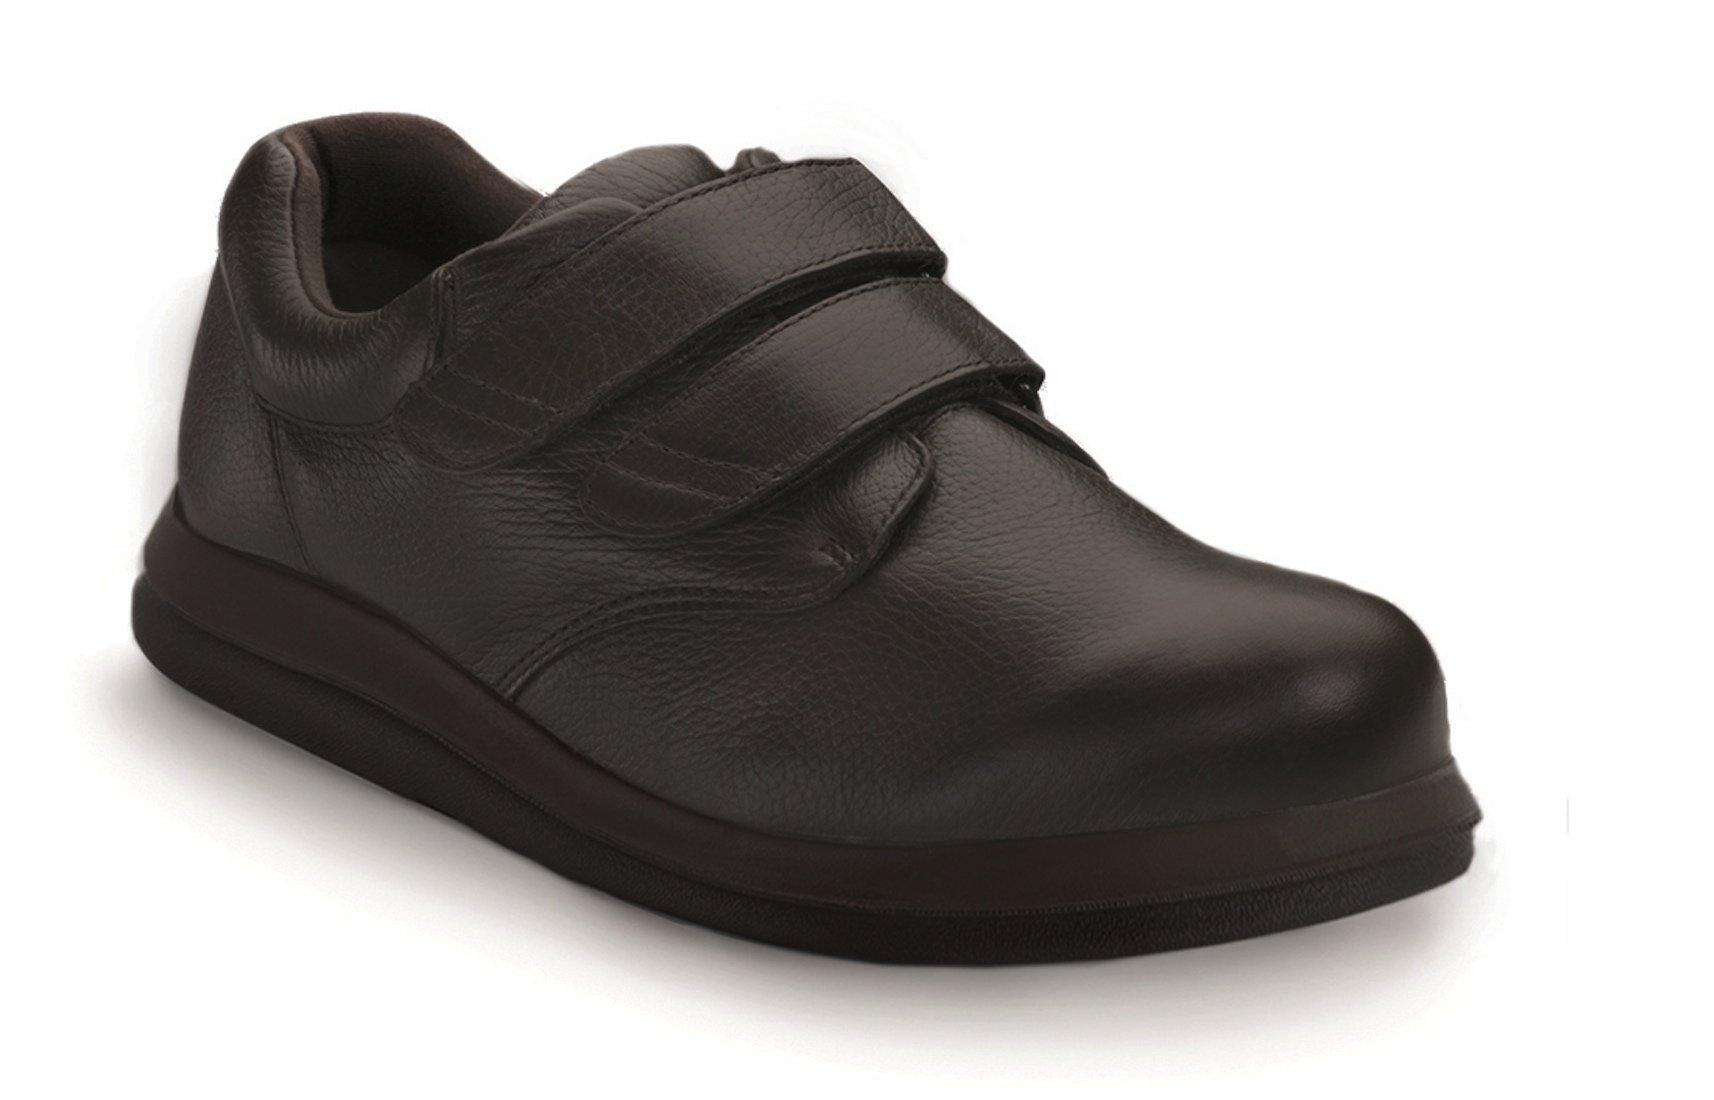 P W Minor Leisure Time DX2 Men's Therapeutic Extra Depth Shoe: Brown 11.5 Medium (D) Velcro